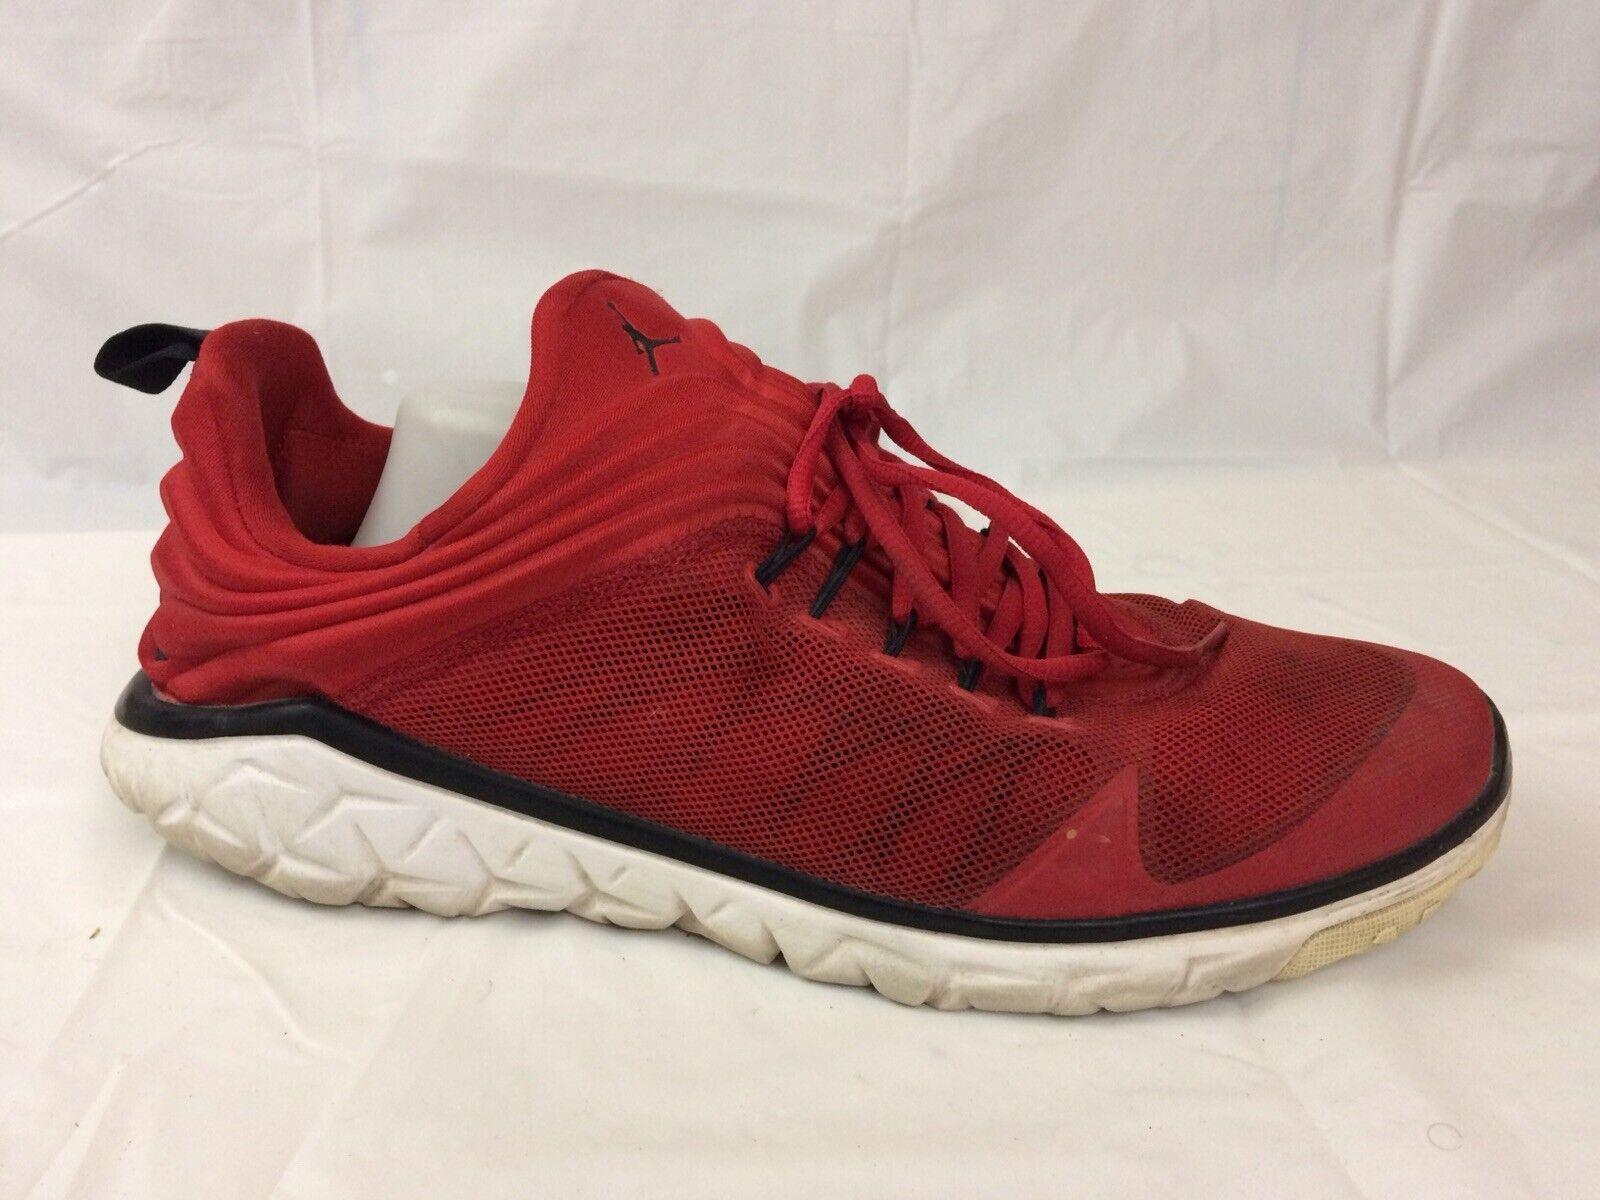 Jordan Flight Flex Trainer Mens 14 Med Gym Sneaker shoes Red Black 654268-601